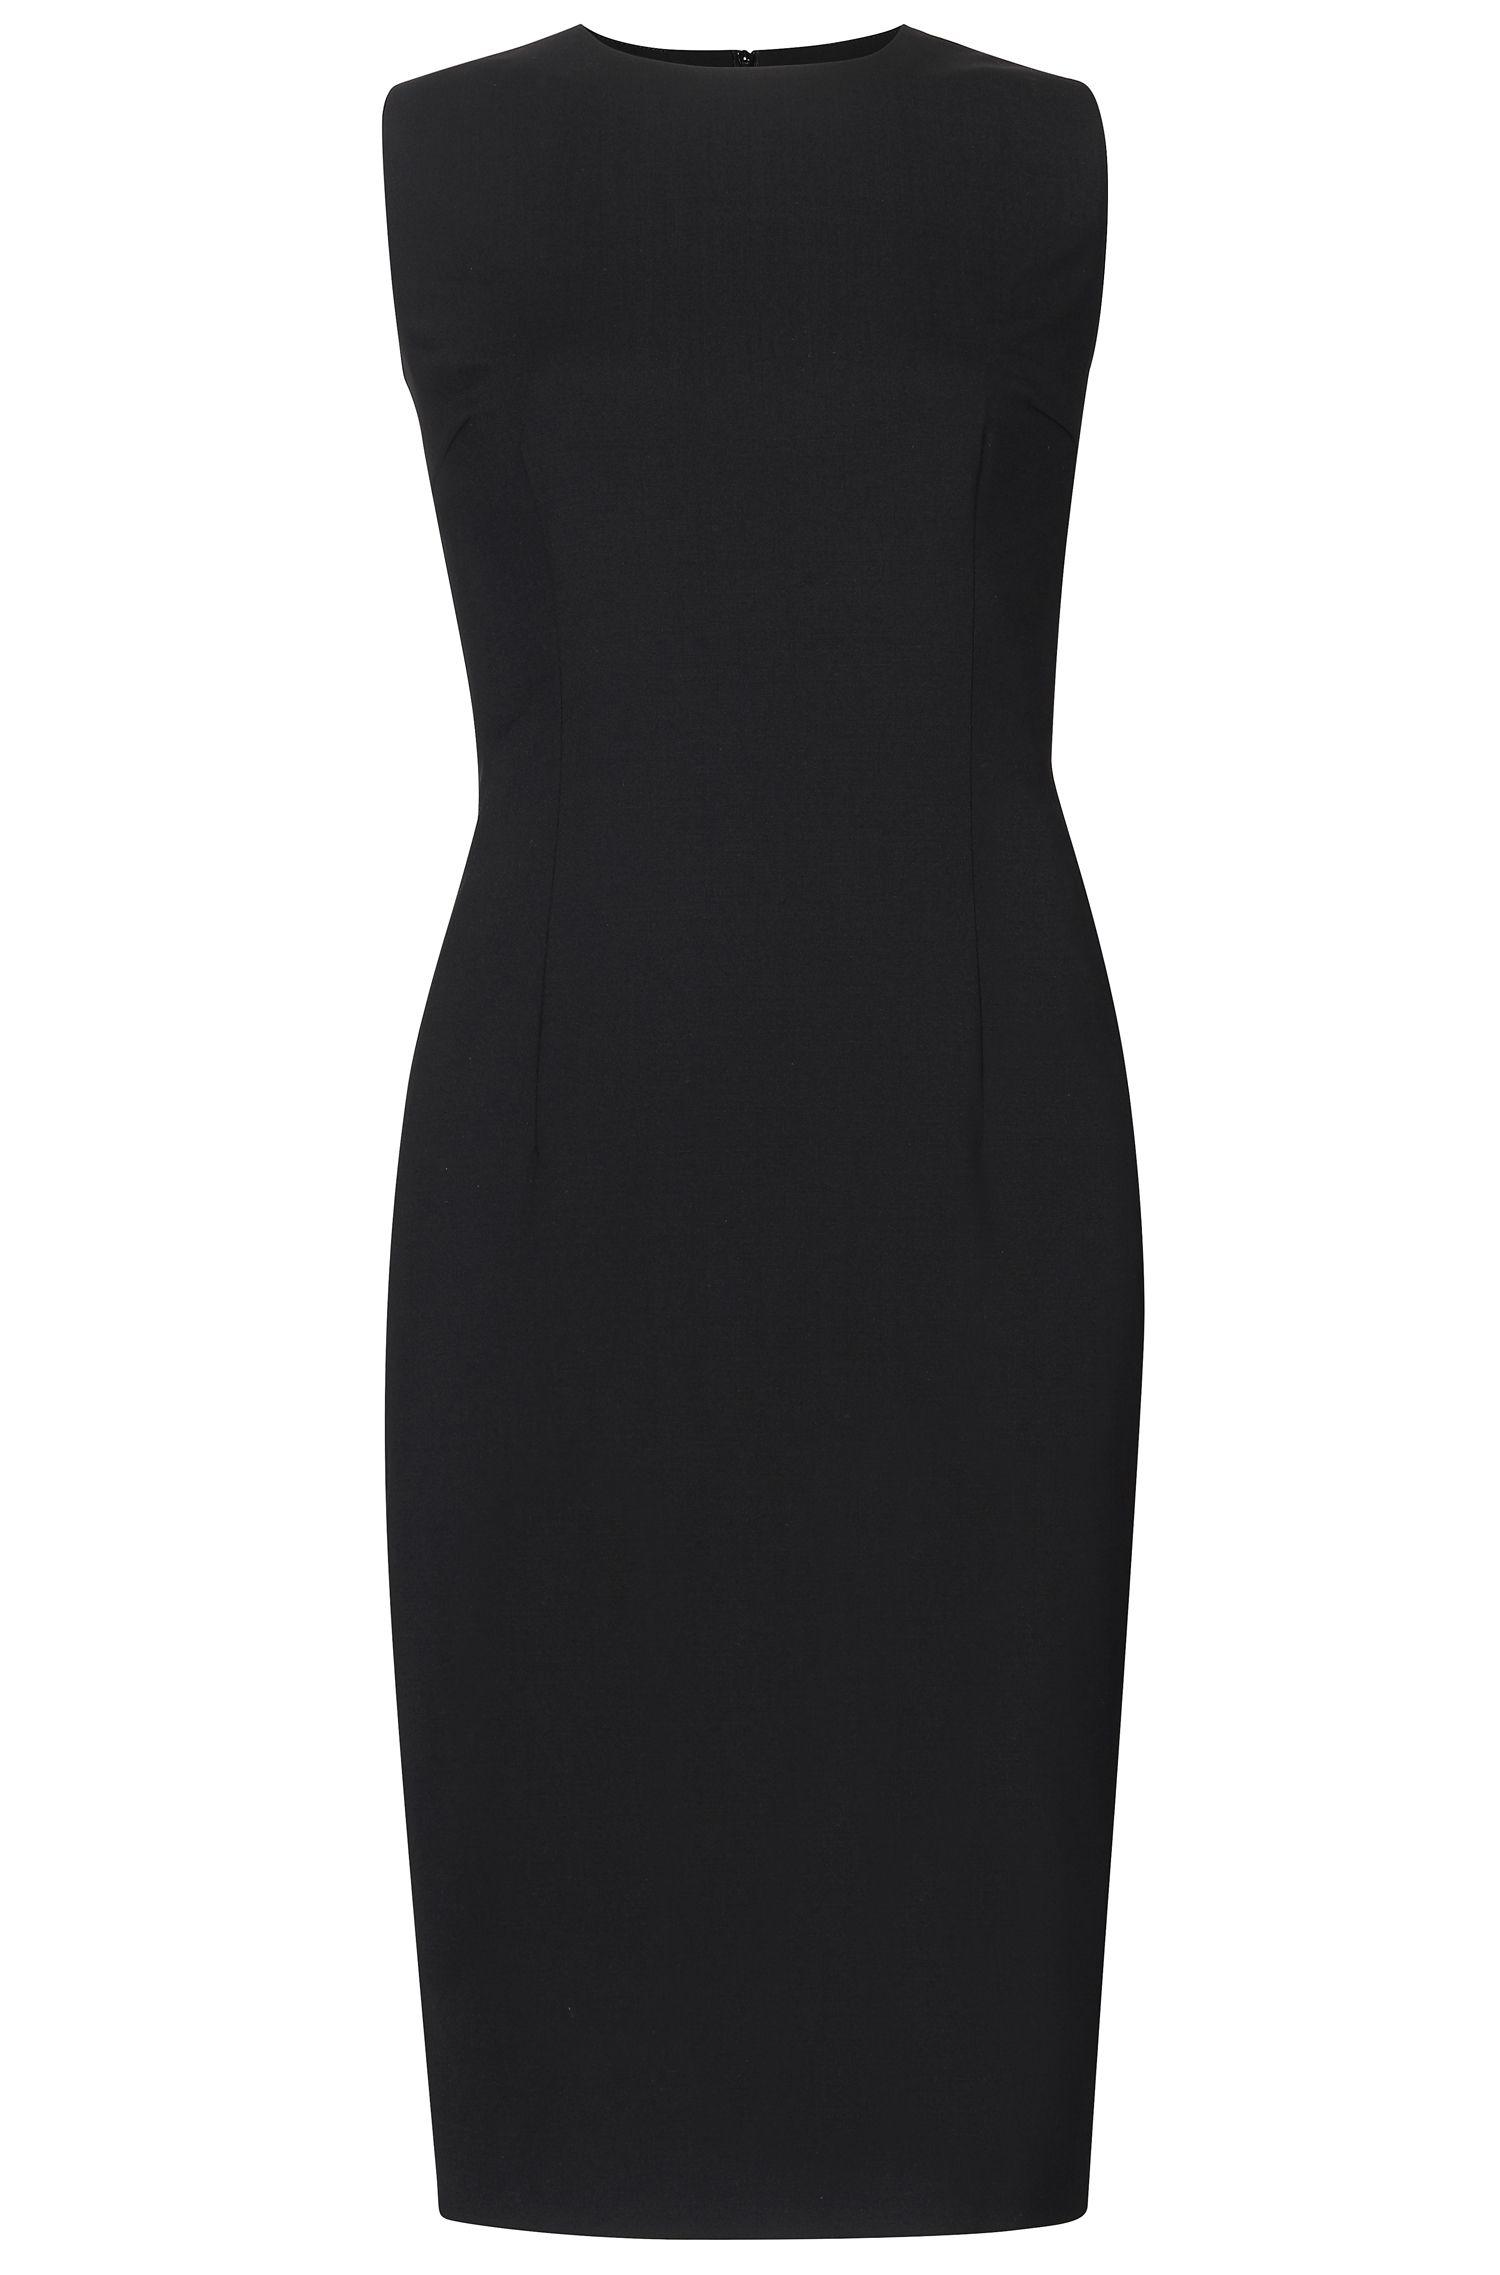 'Dirusa'   Stretch Virgin Wool Shift Dress